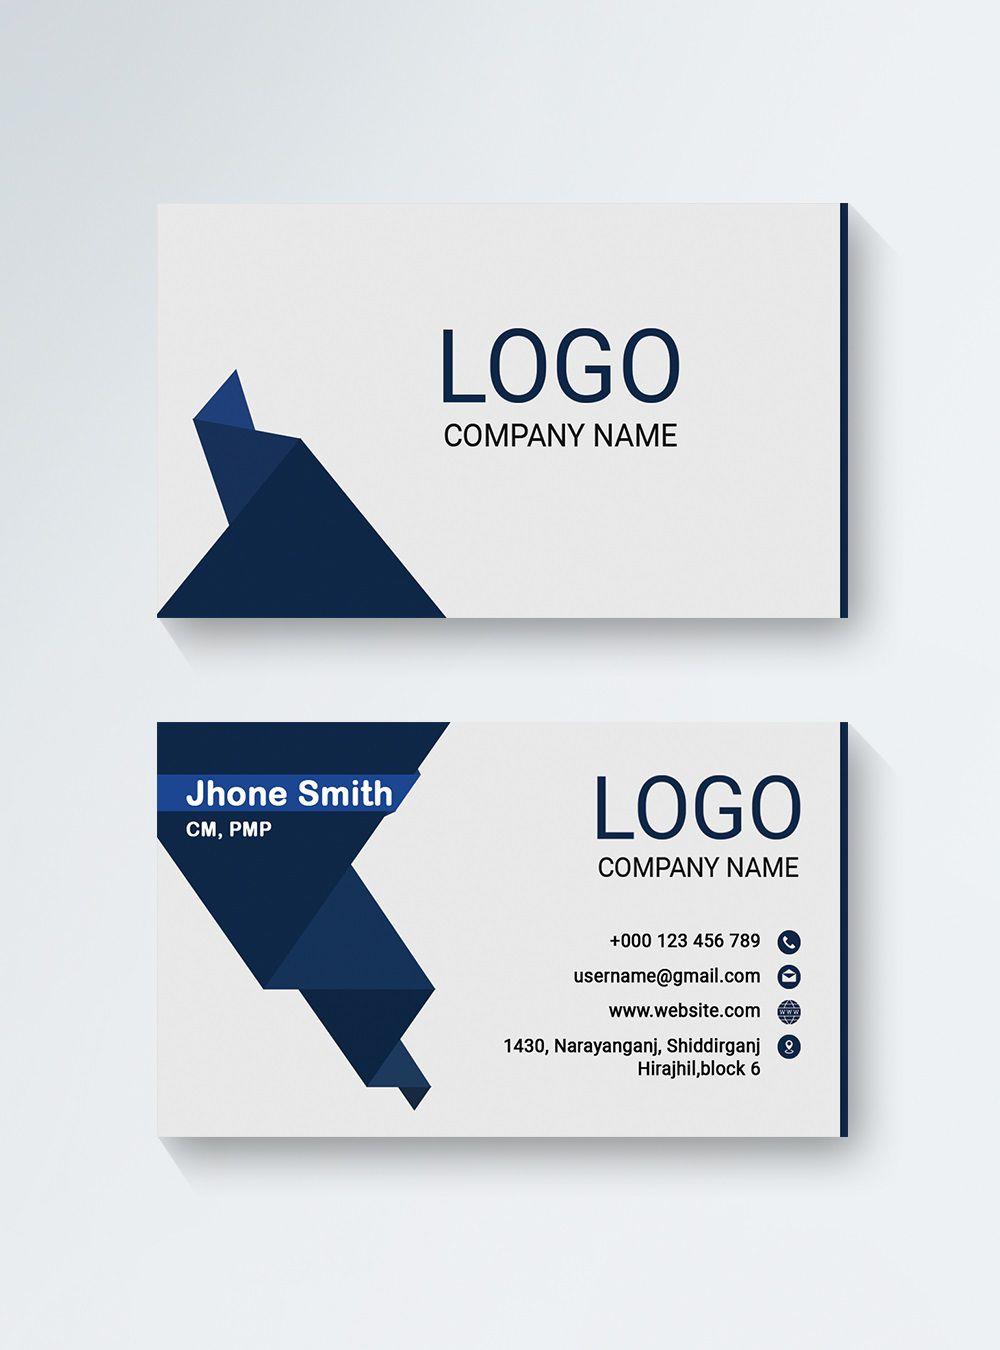 003 Wondrou Minimal Busines Card Template Free Download Sample  Simple Design CoreldrawFull